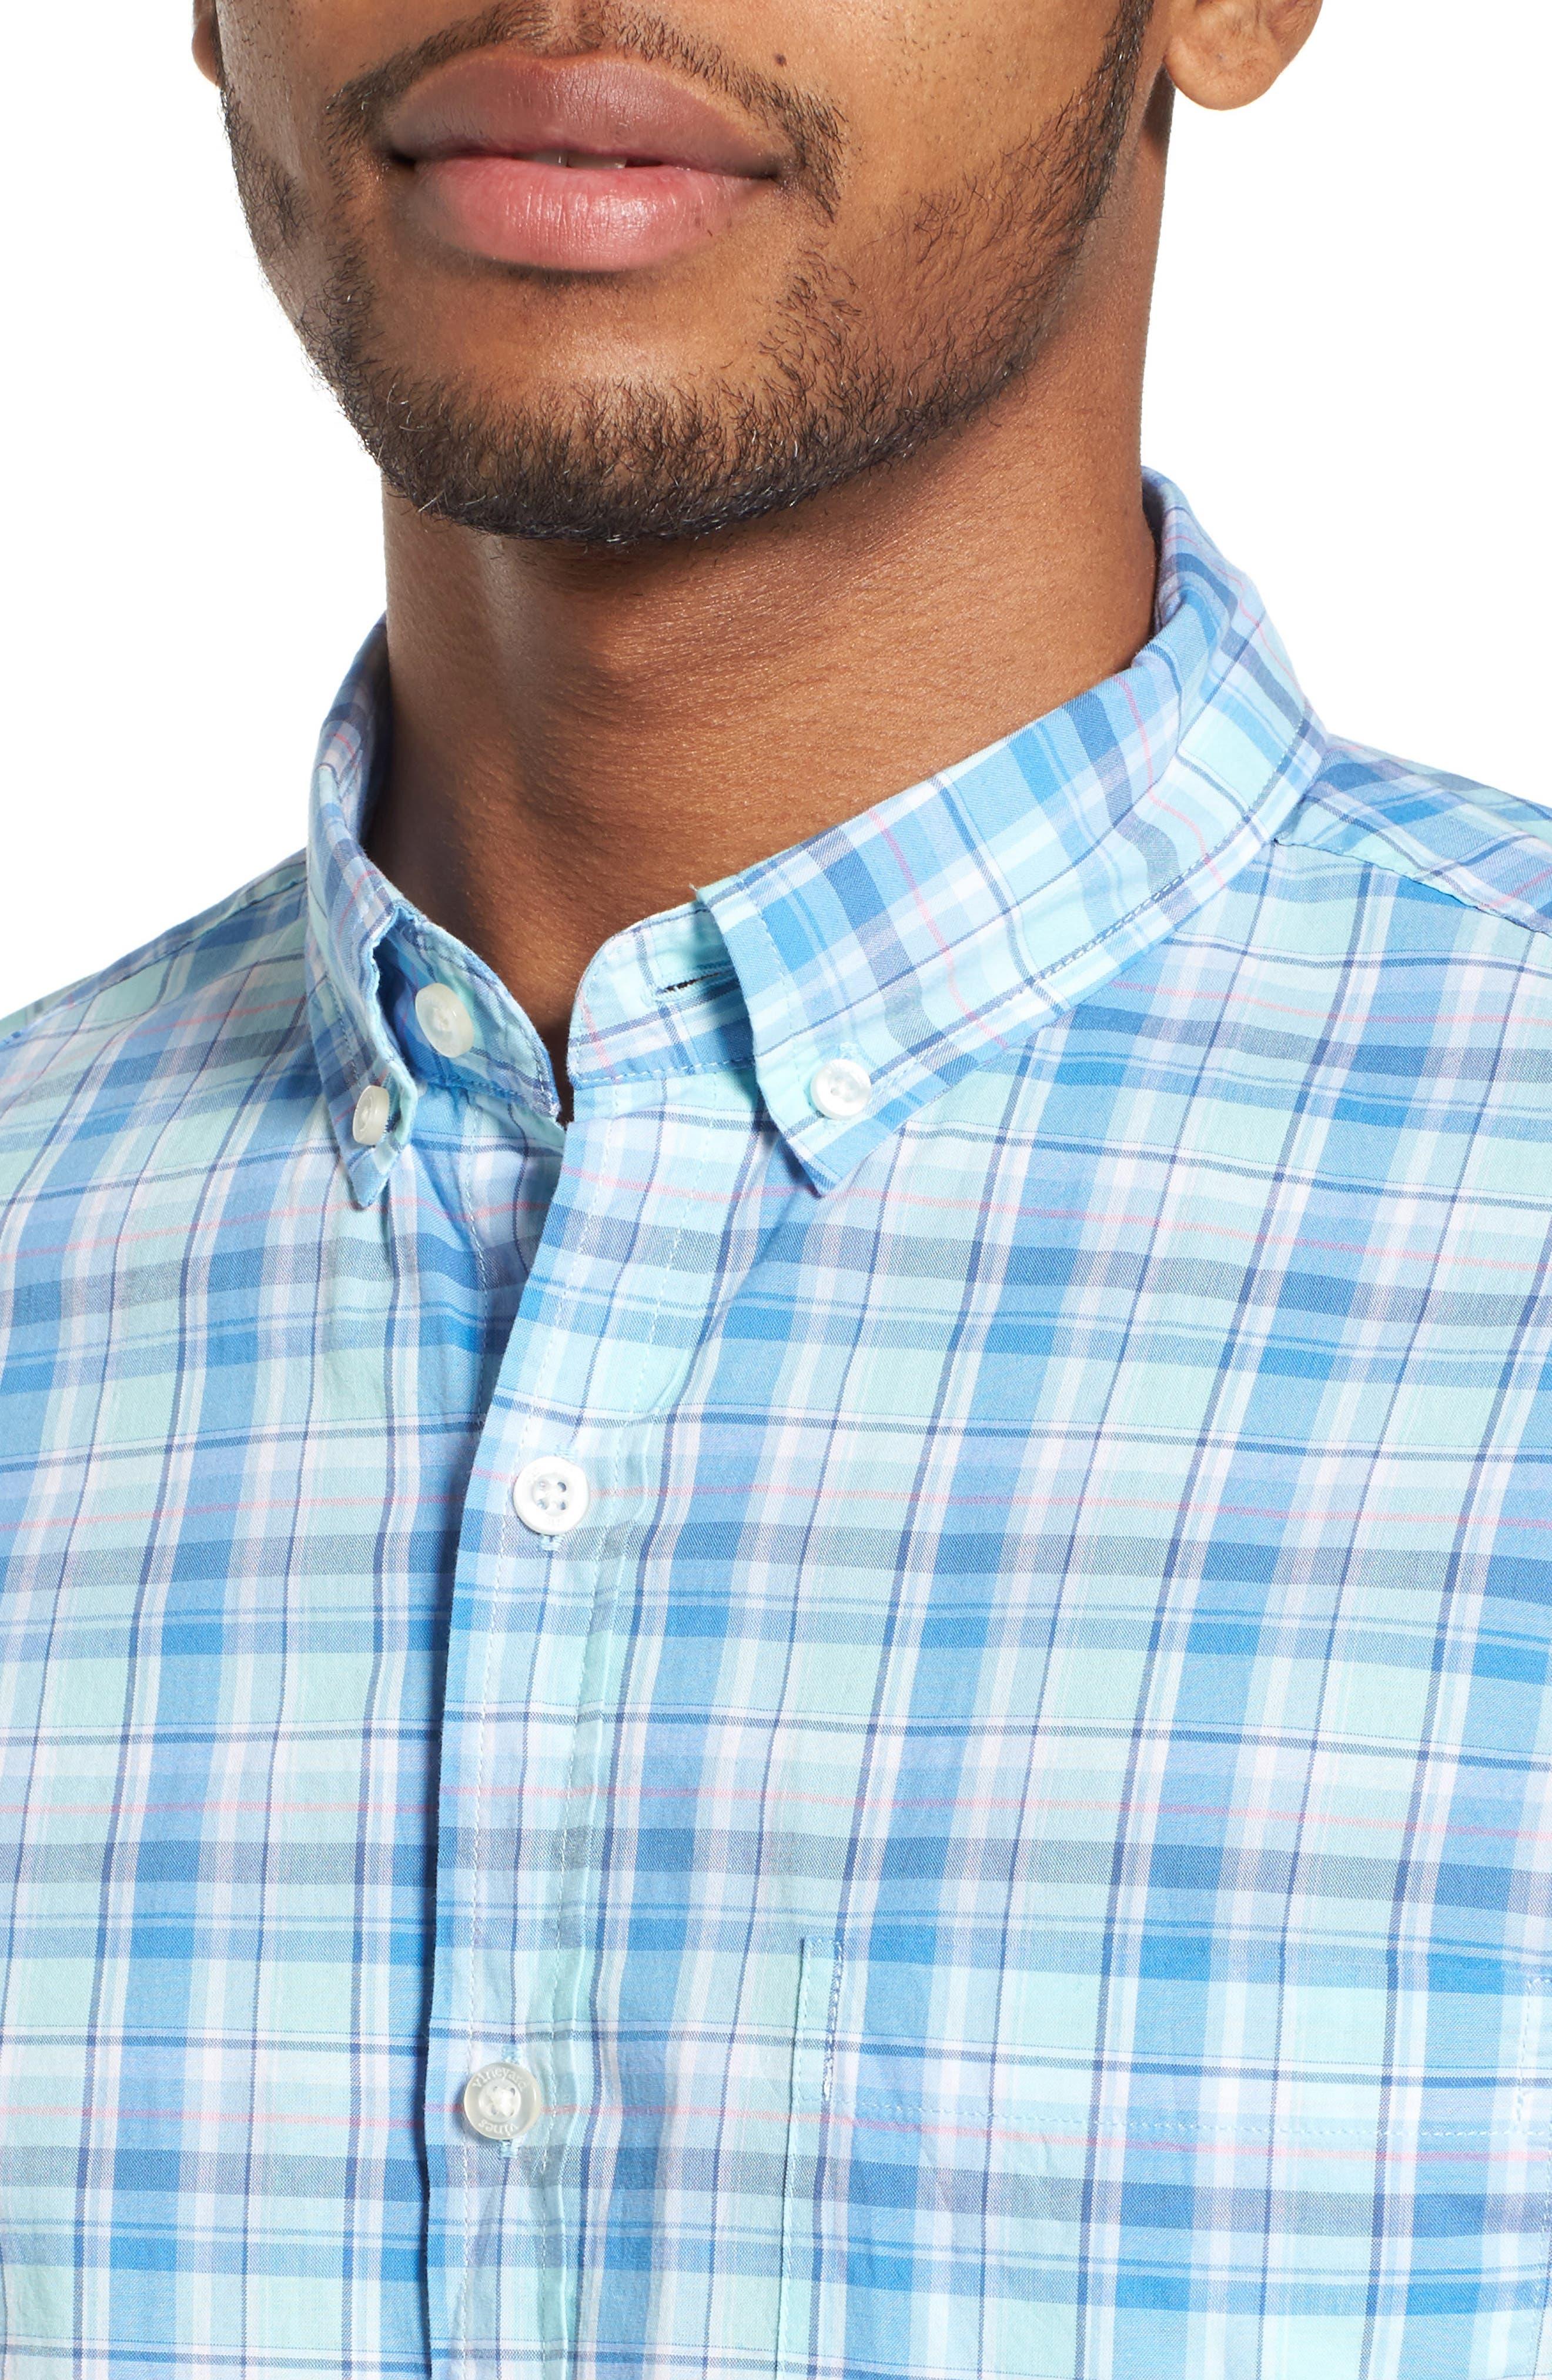 Murray Pine Island Slim Fit Plaid Sport Shirt,                             Alternate thumbnail 4, color,                             422